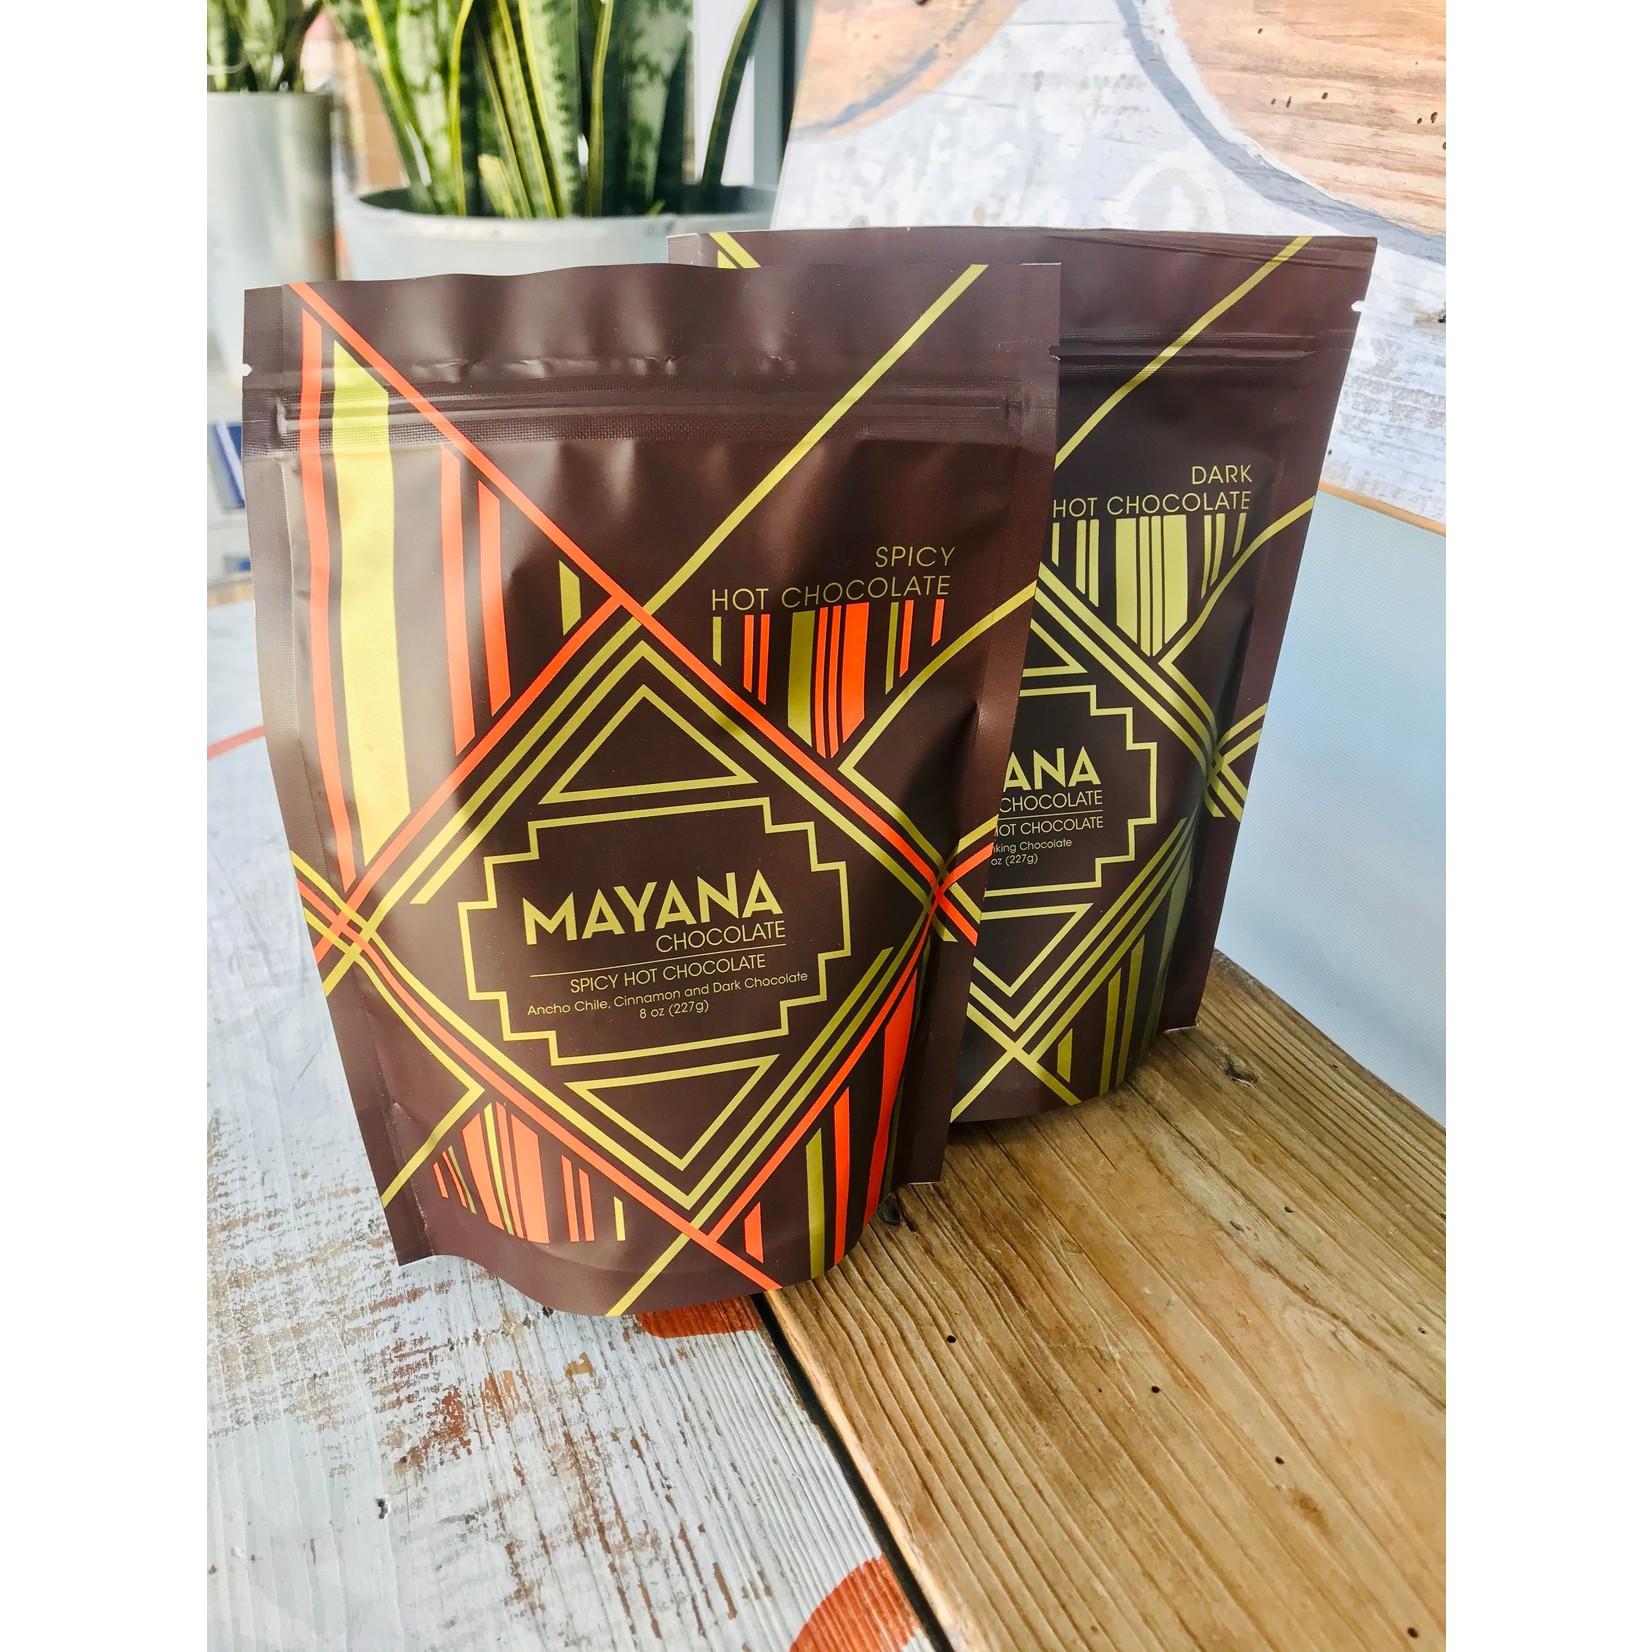 Mayana Chocolate Mayana Hot Chocolate Mix